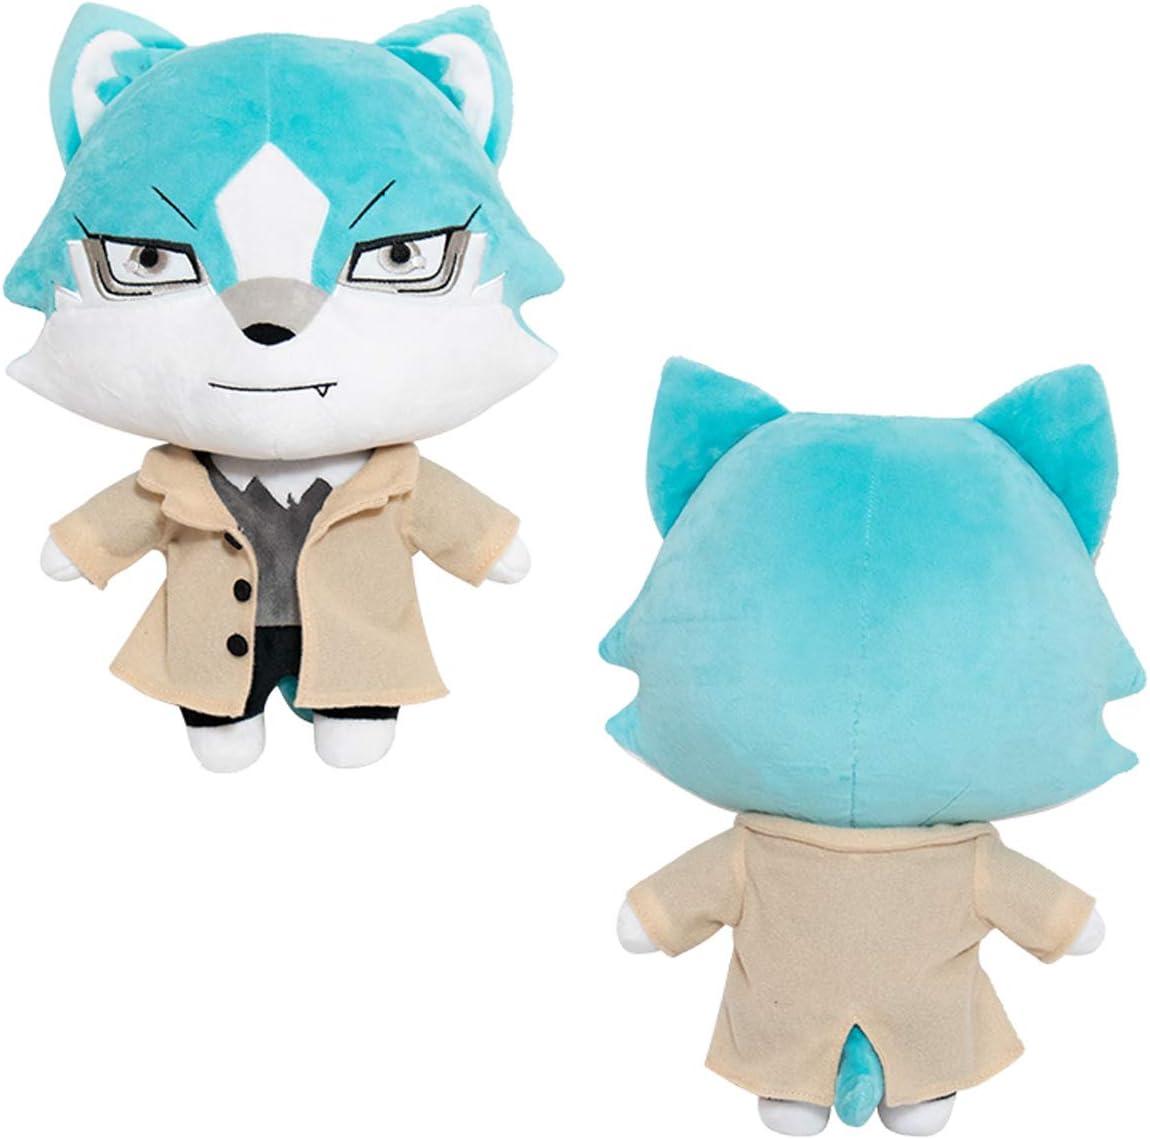 Enhopty Animal Plush Doll Kagemori Michiru Ogami Shirou Stuffed Anime Plush Kawaii Toys Nap Pillow Home Sofa Decoration 14.1in